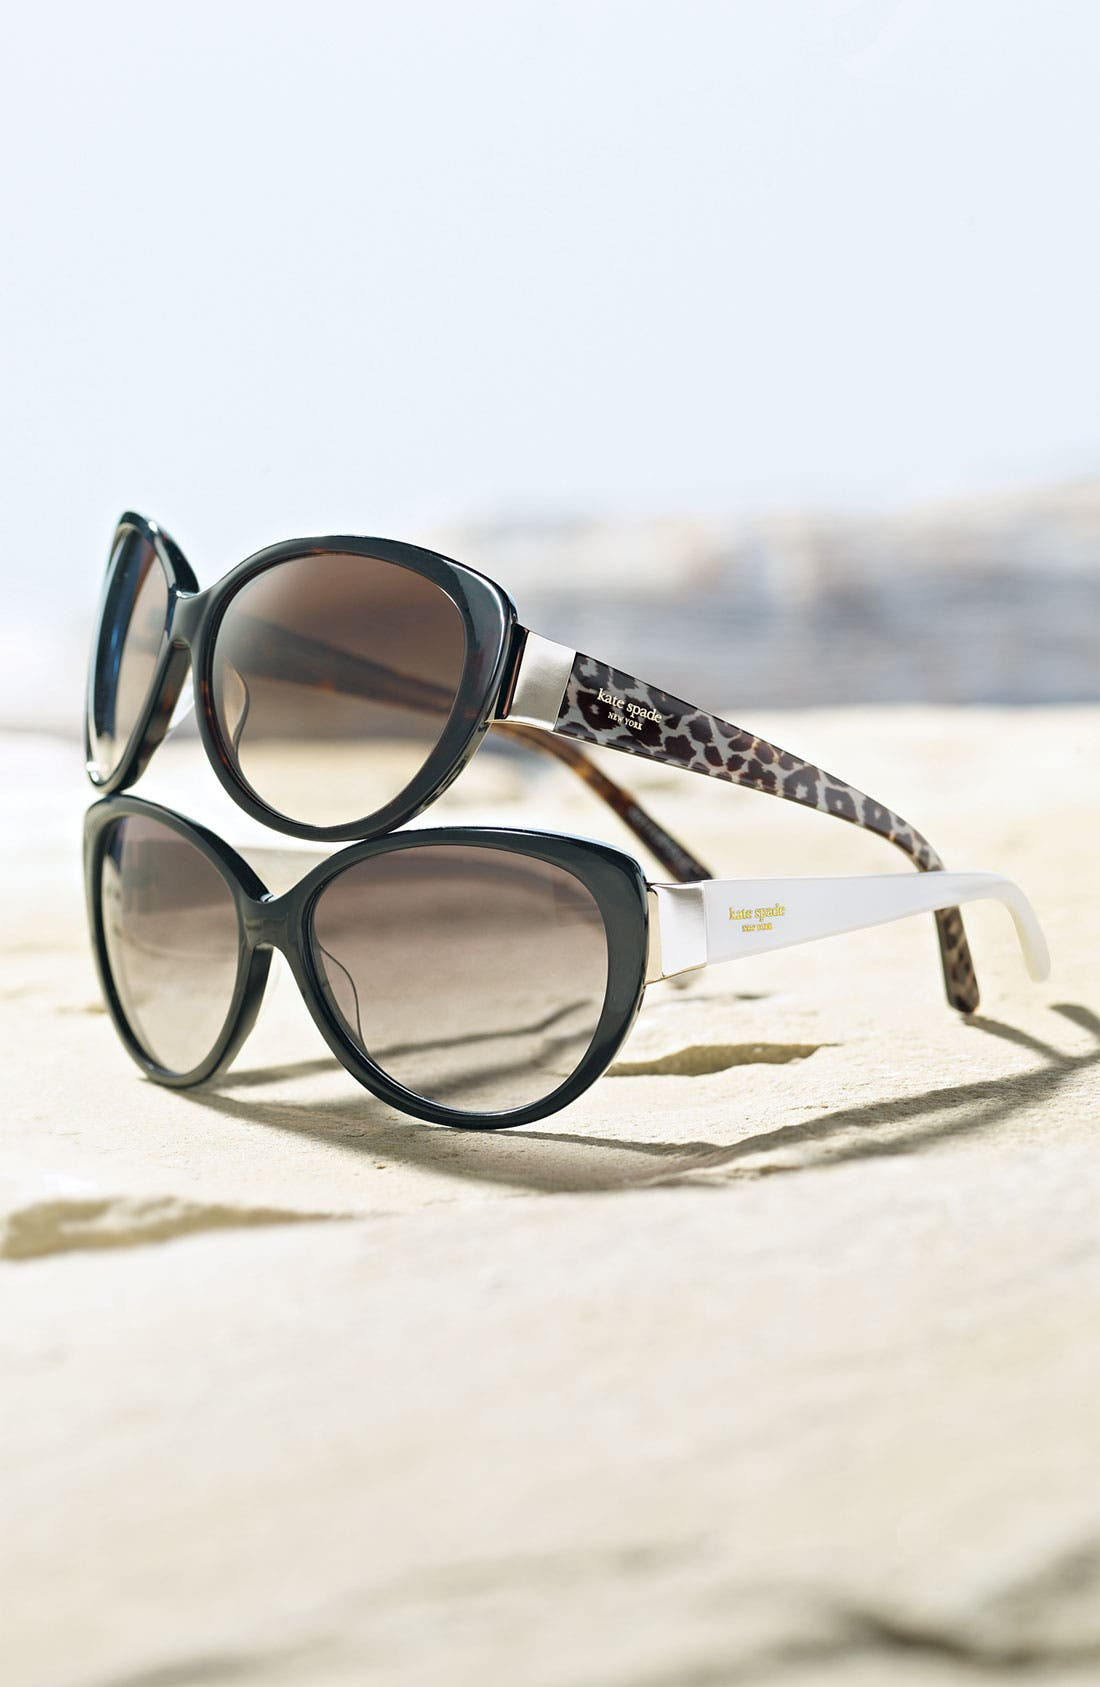 KATE SPADE NEW YORK,                             'soliel' cat's eye sunglasses,                             Alternate thumbnail 2, color,                             001